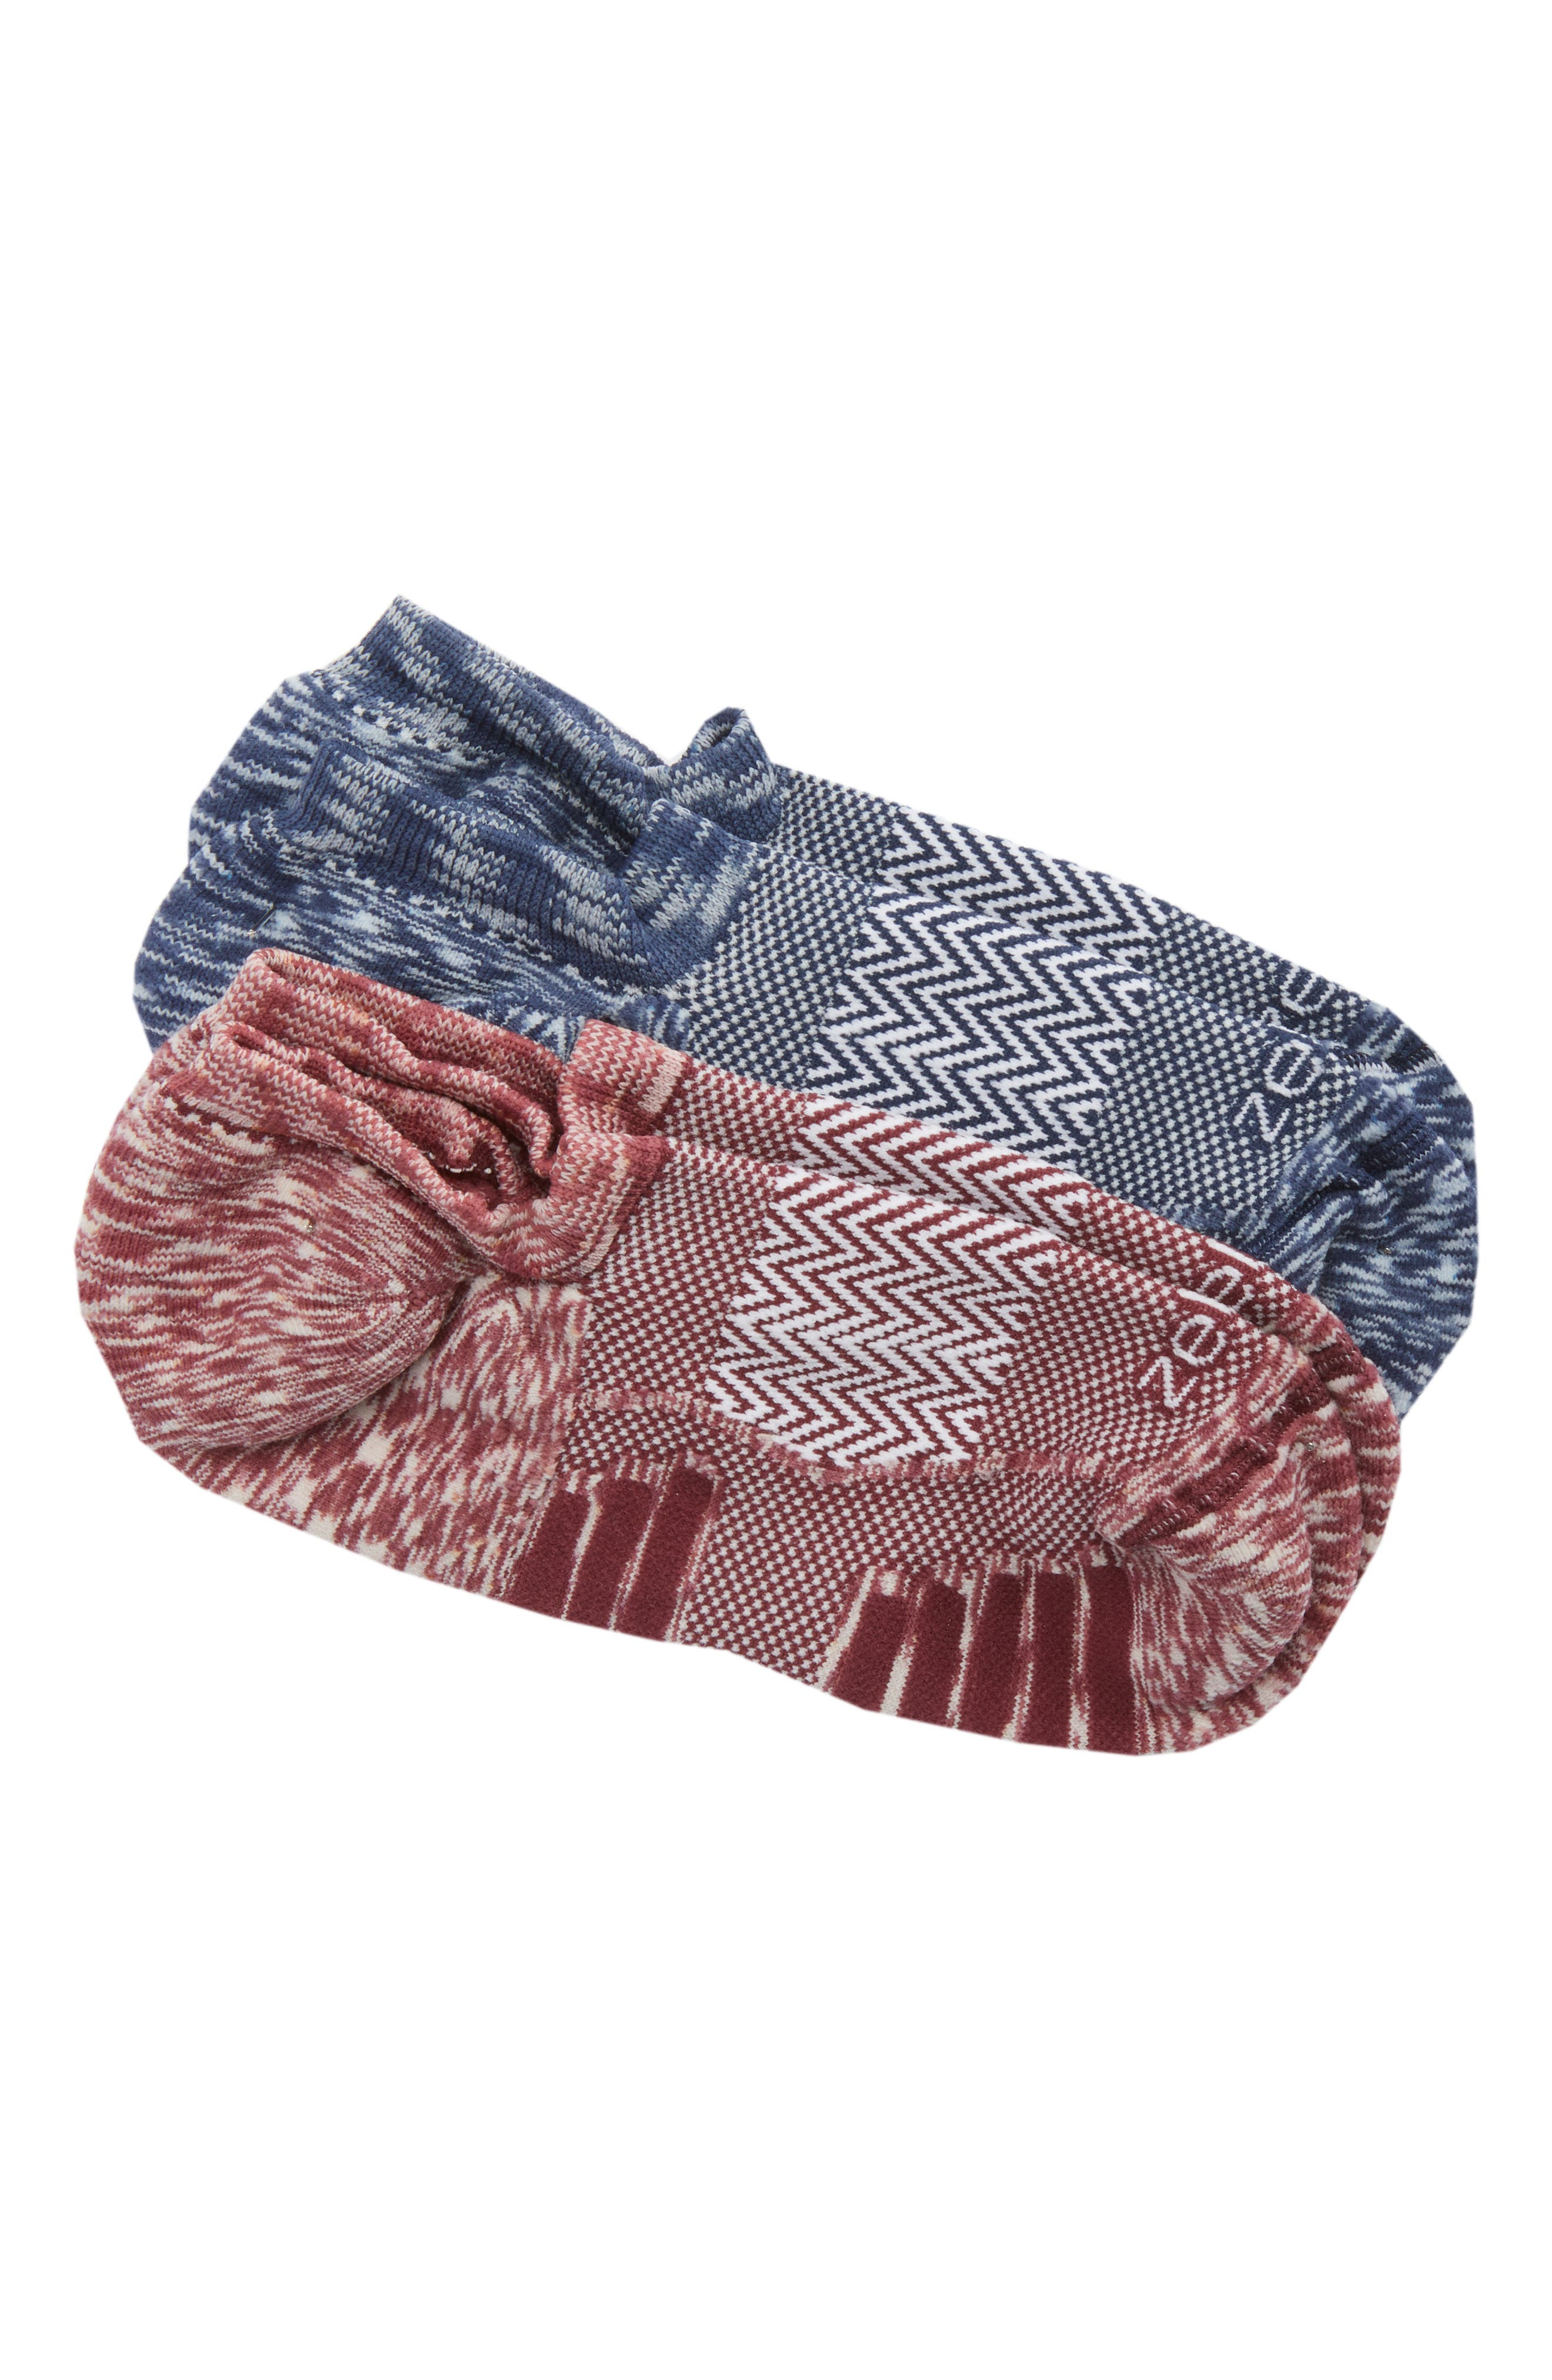 Ultra Light Run 2-Pack Socks,                             Main thumbnail 1, color,                             Red Tannin